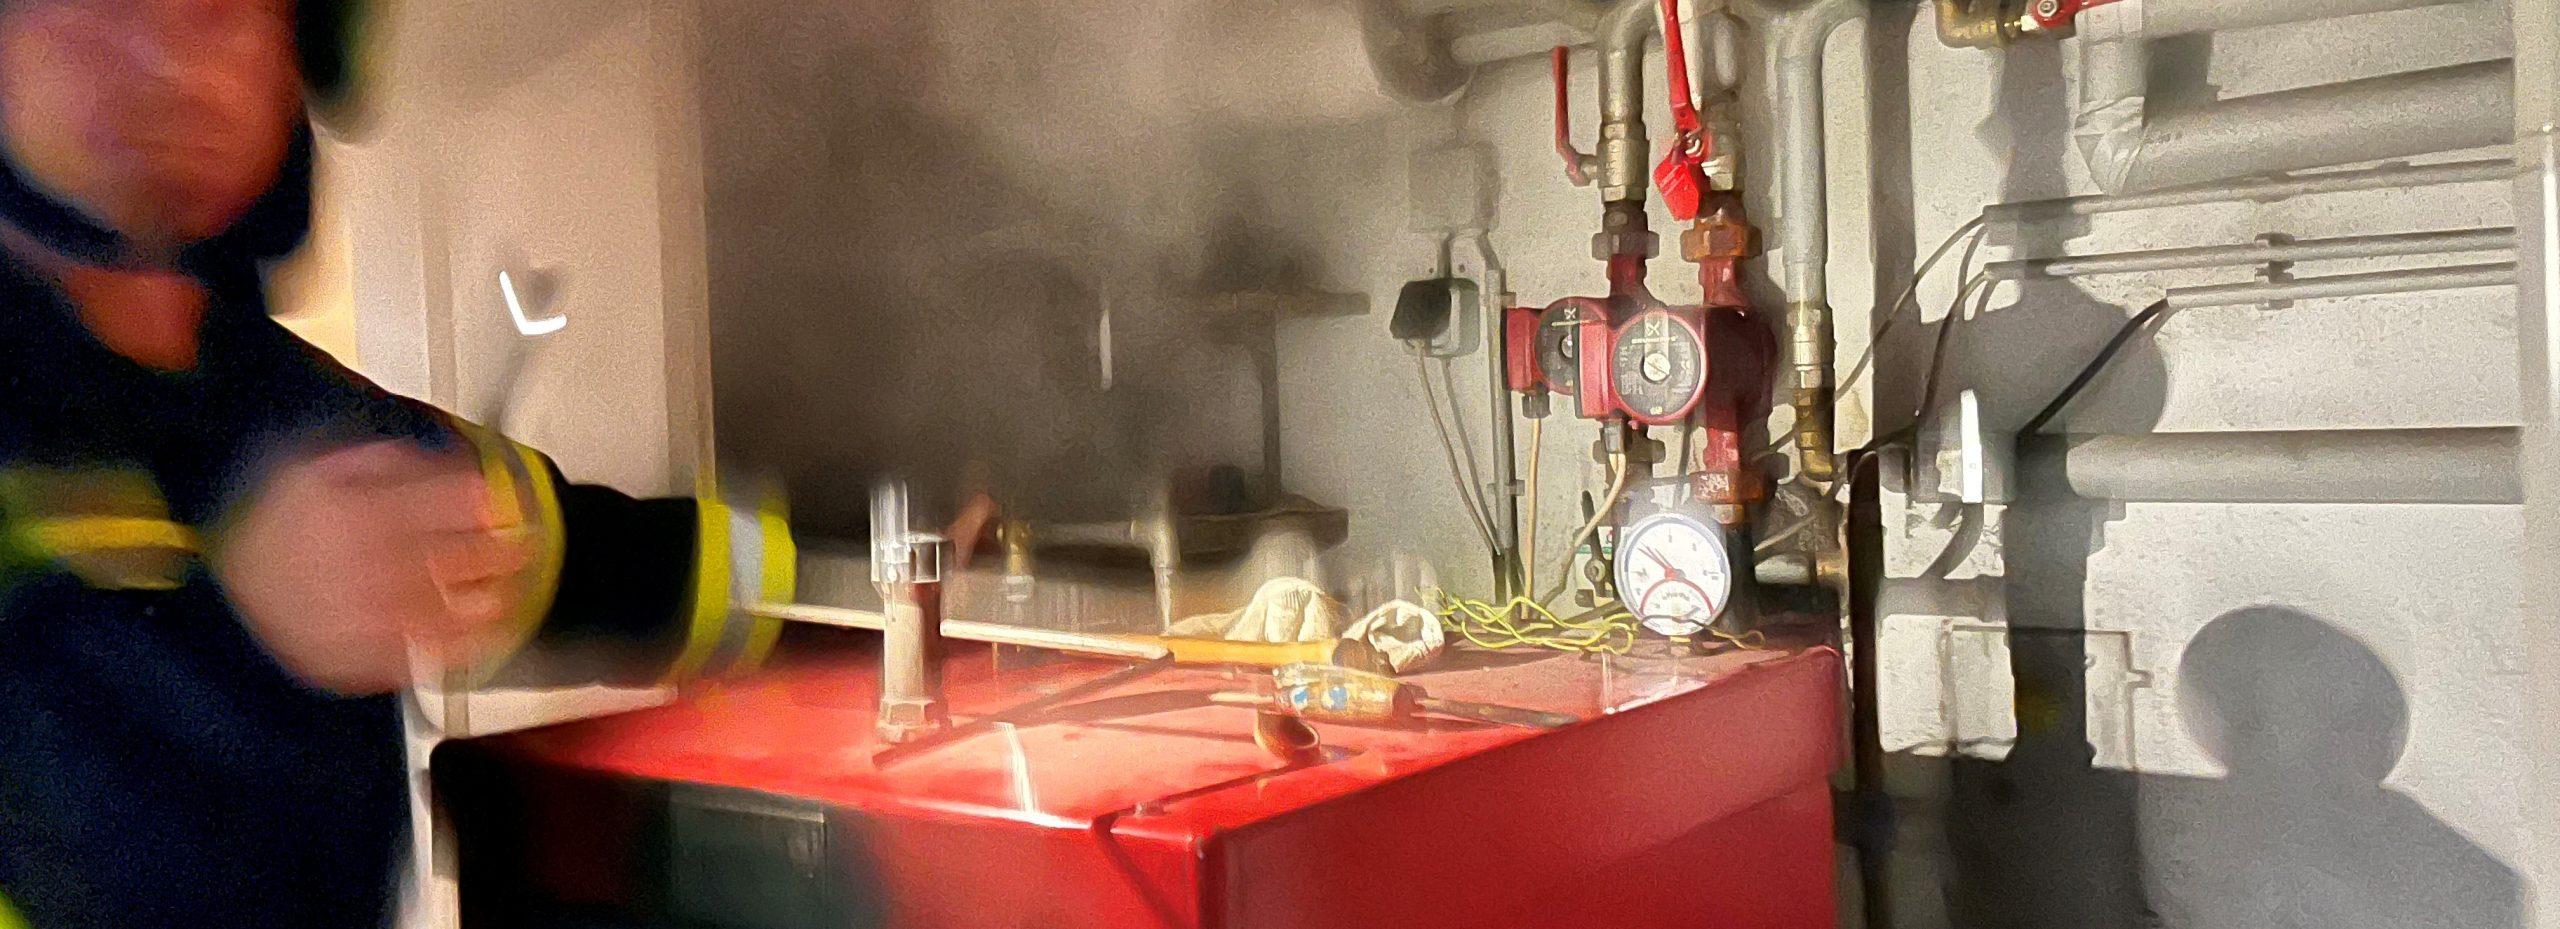 B1 Brandverdacht 24.10.2021